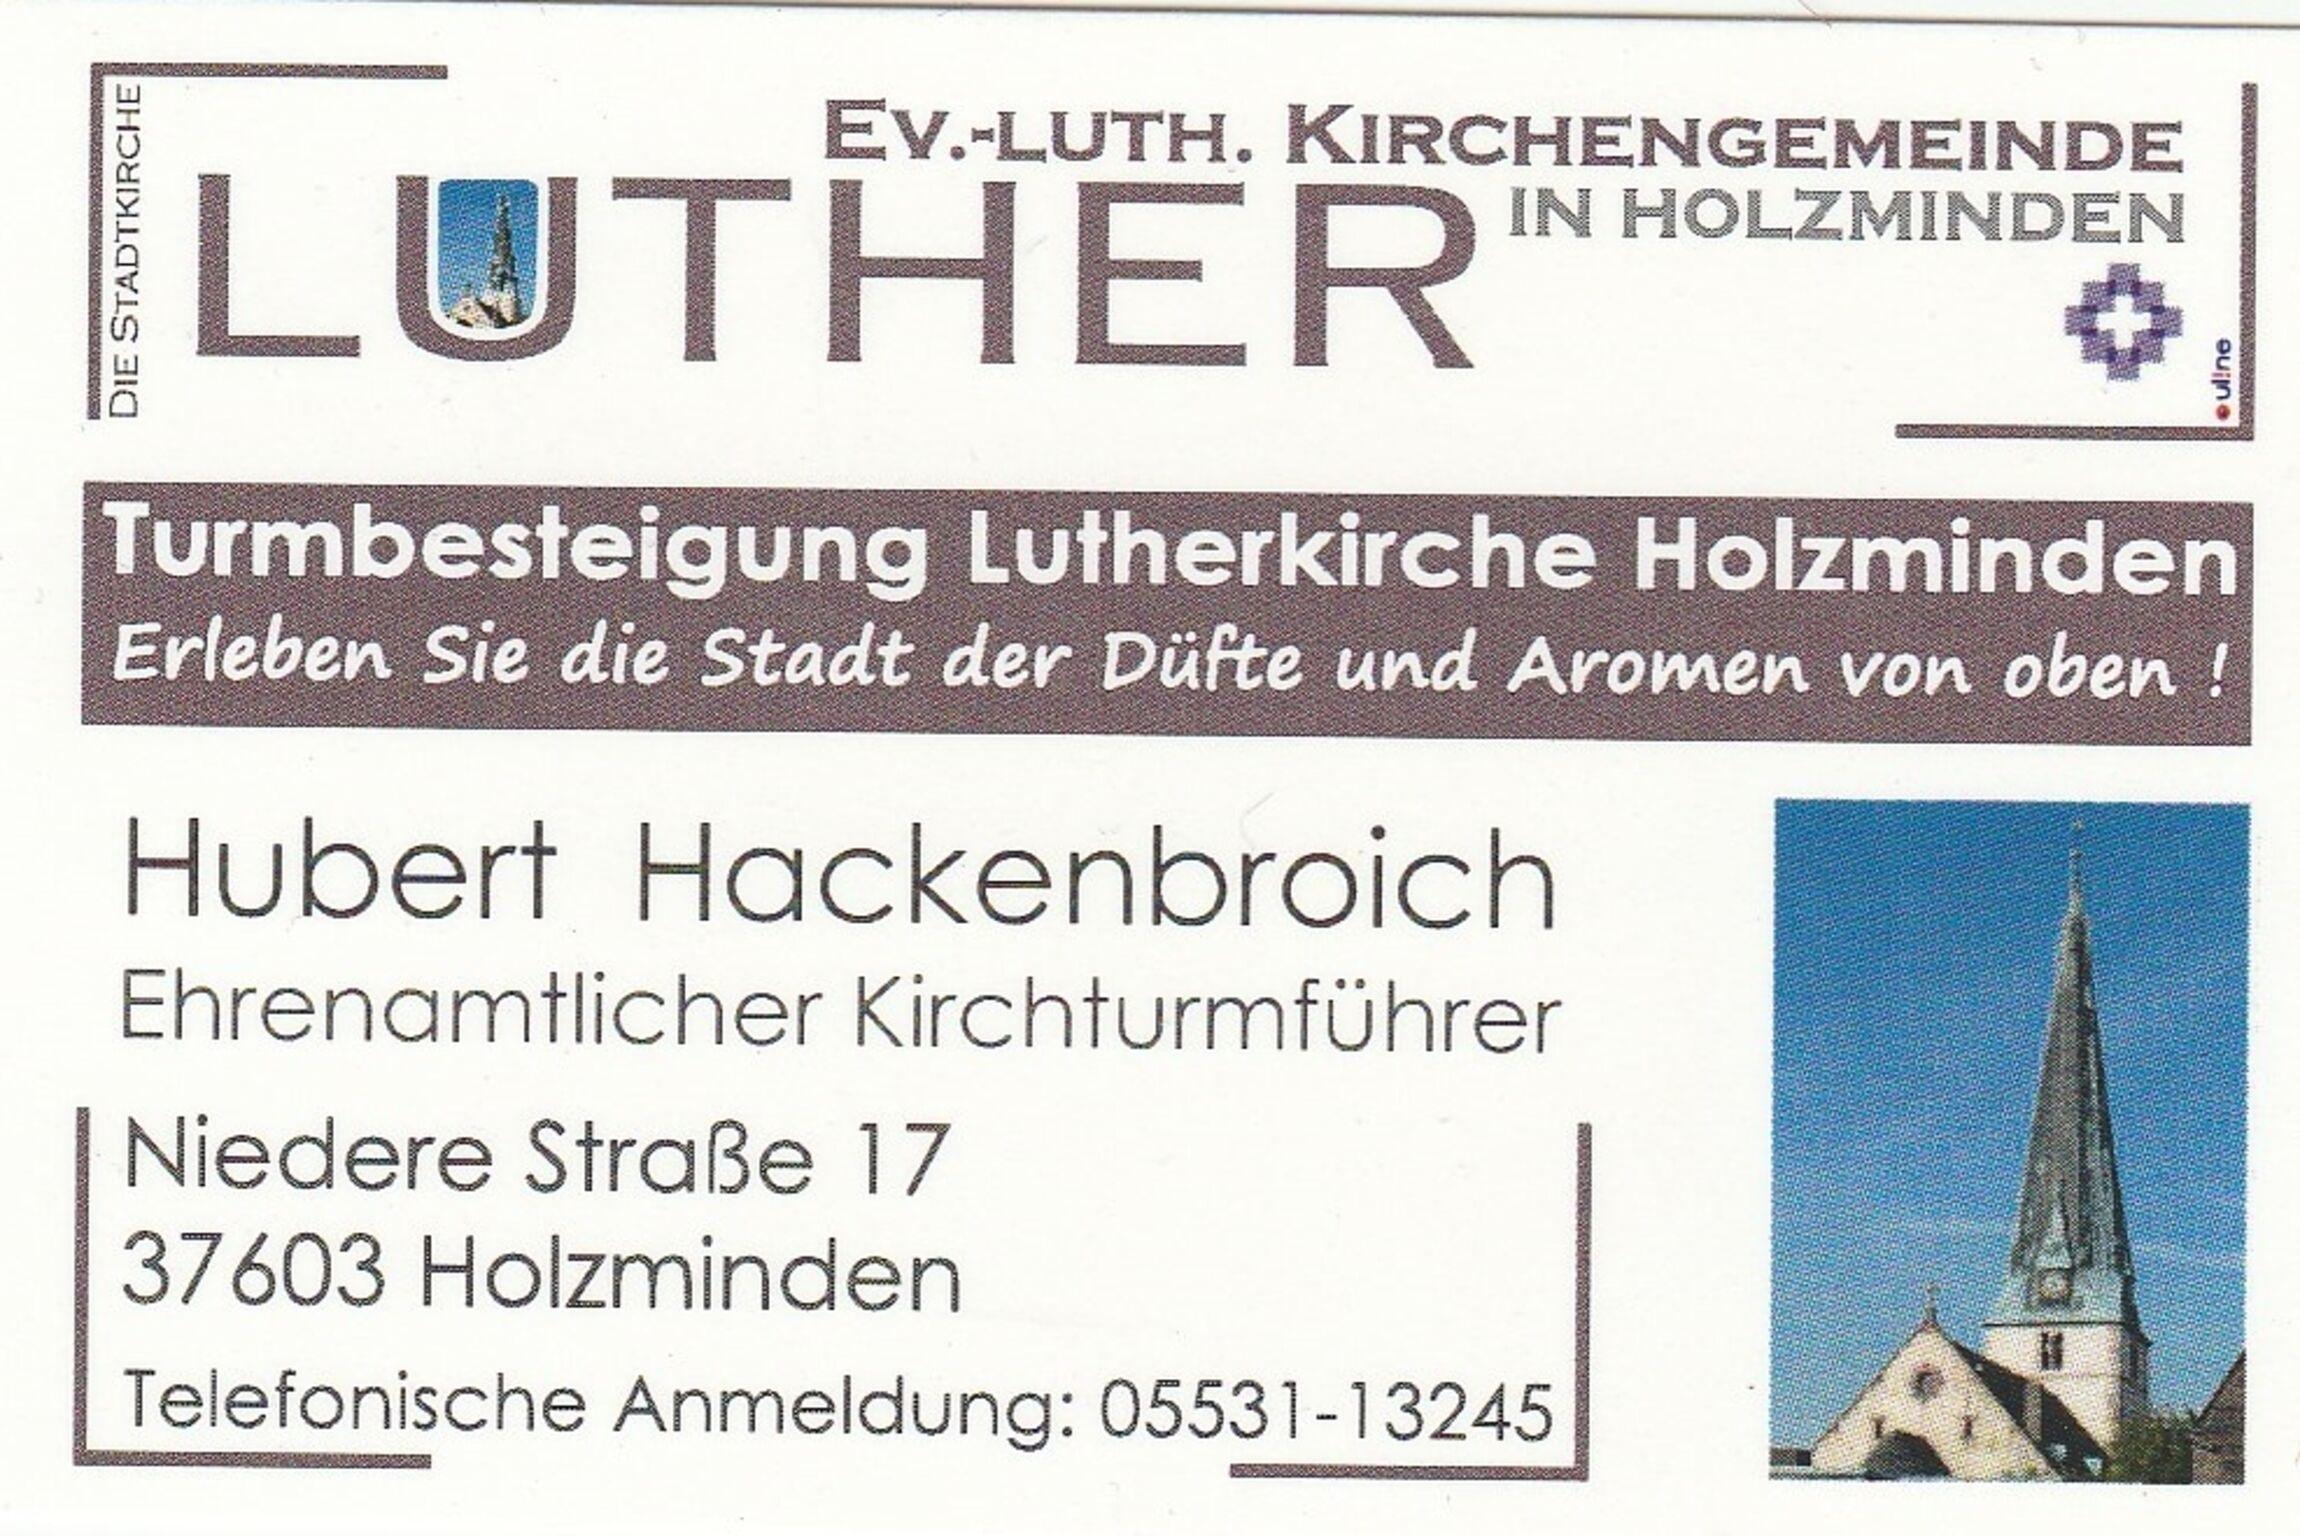 Hackenbroich-Visitenkarte